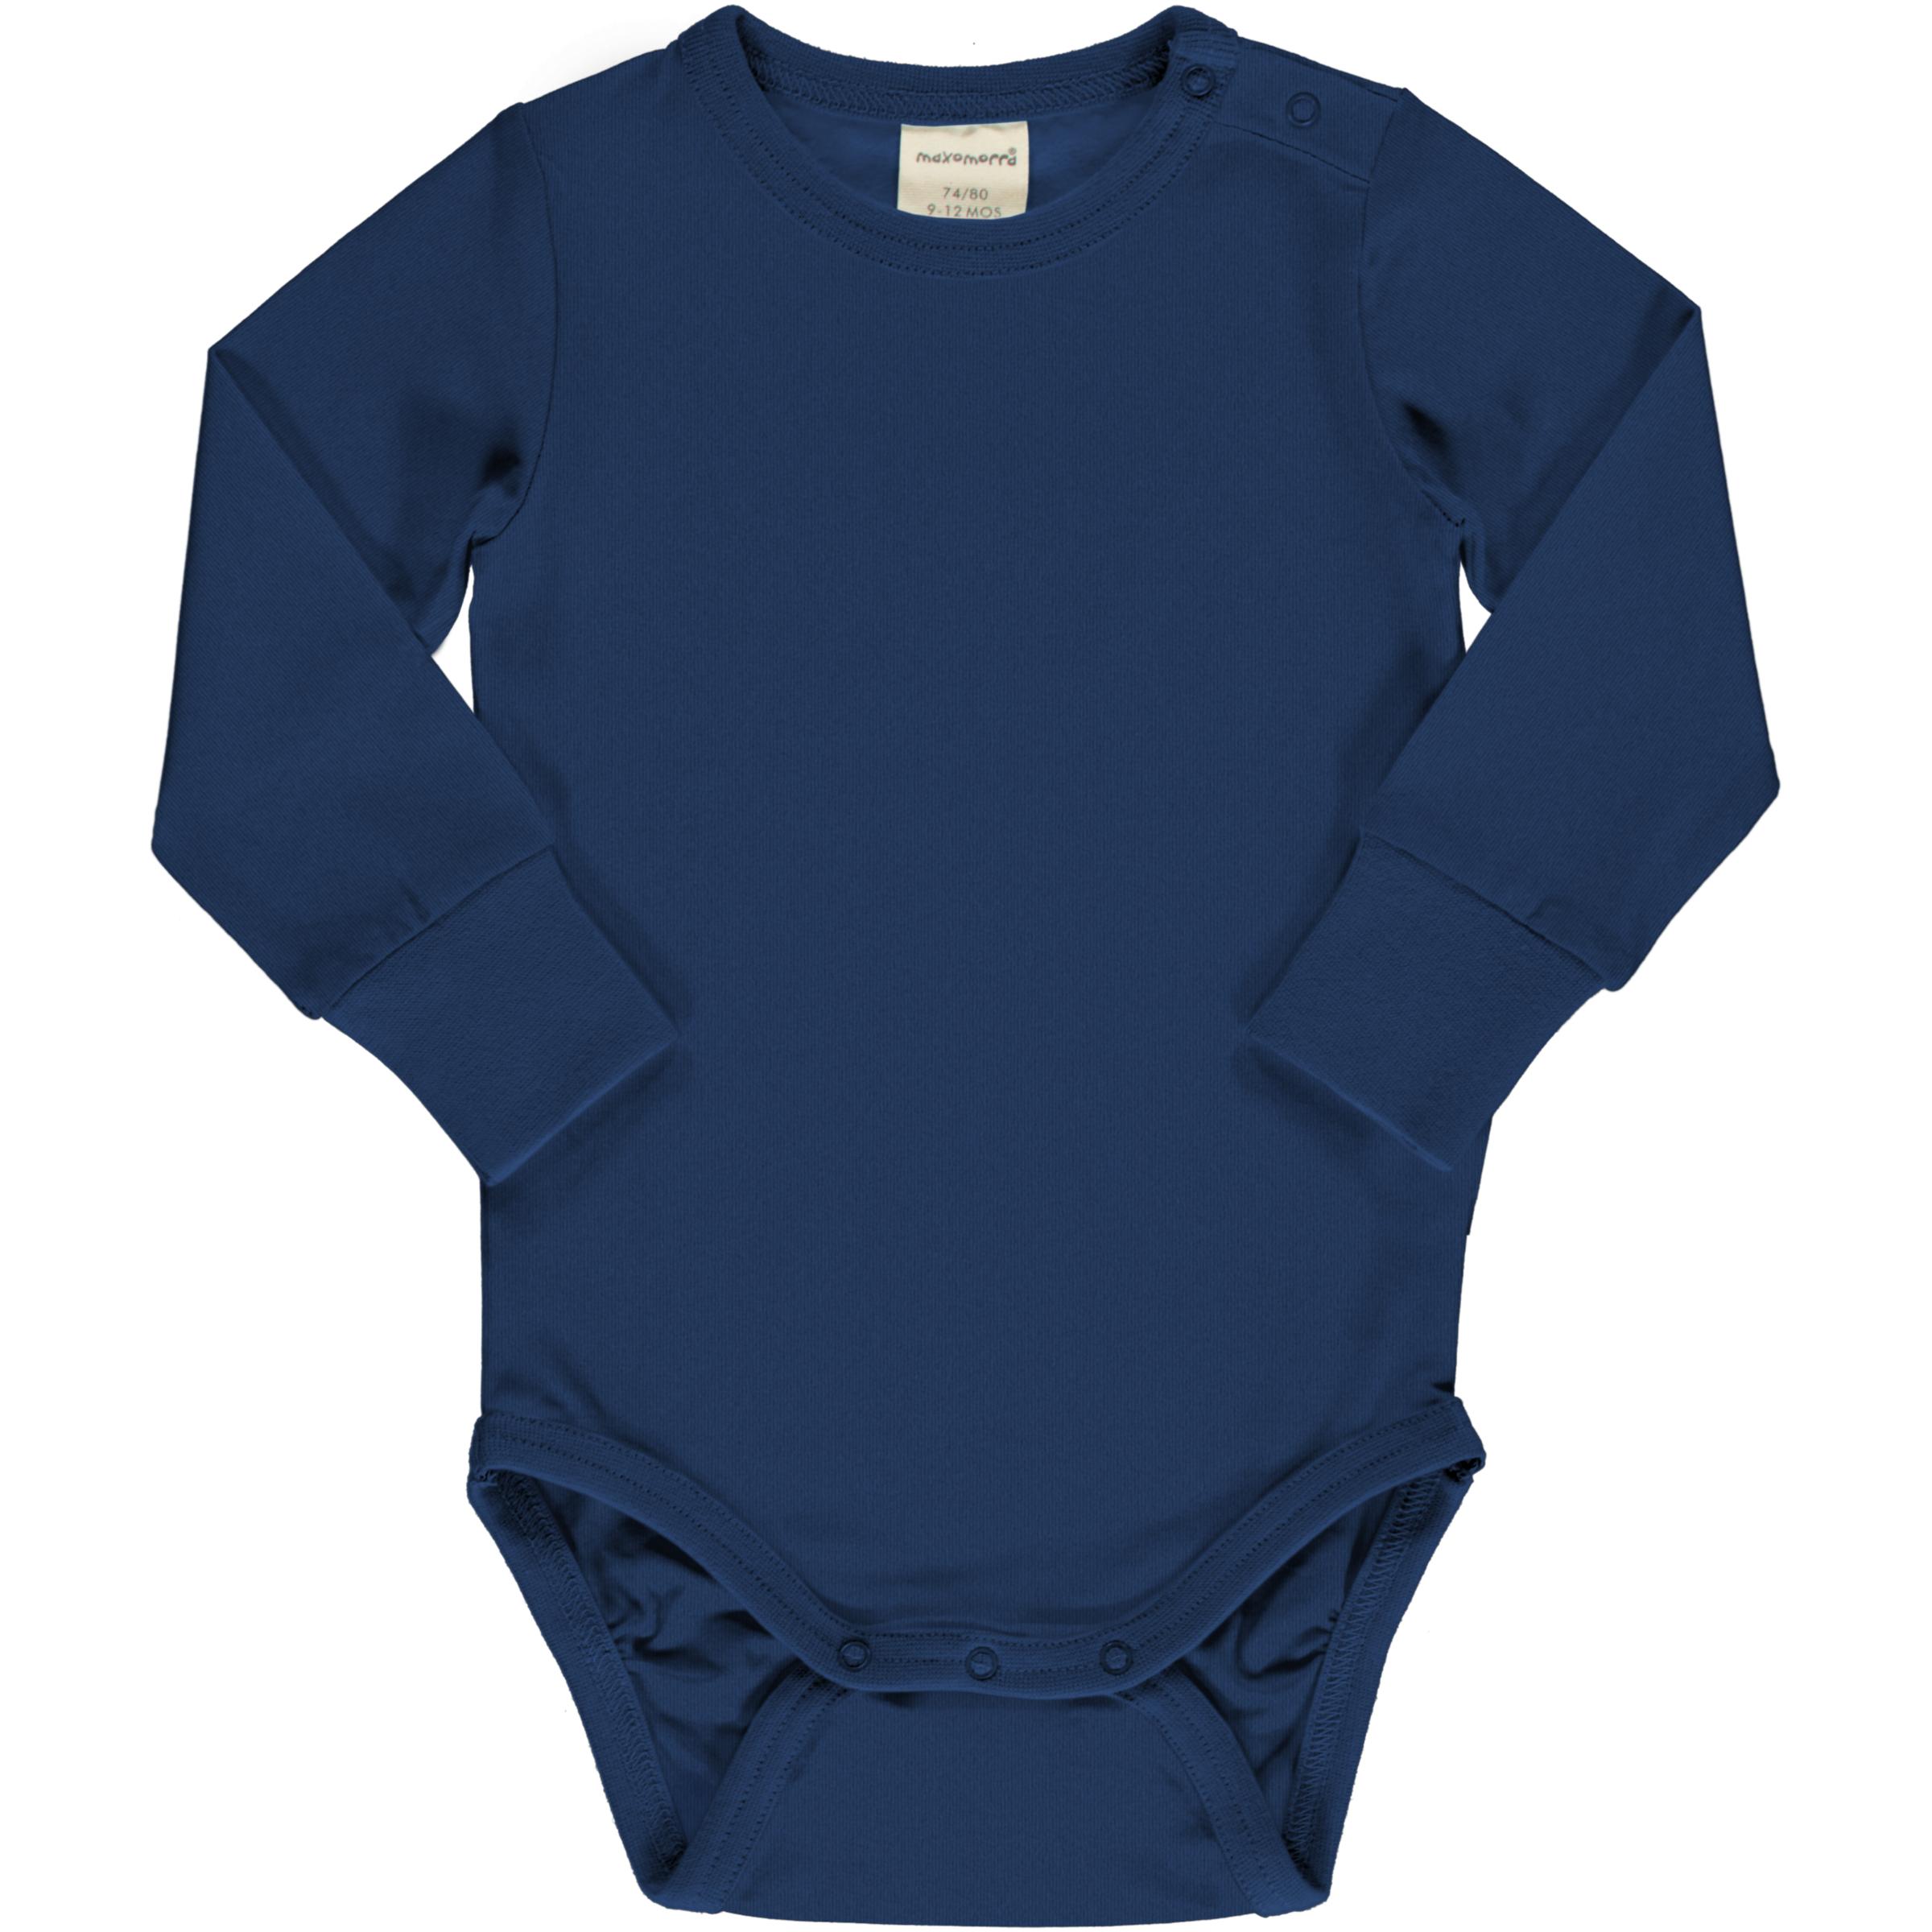 Maxomorra Baby Body Langarm Solid NAVY 050/056